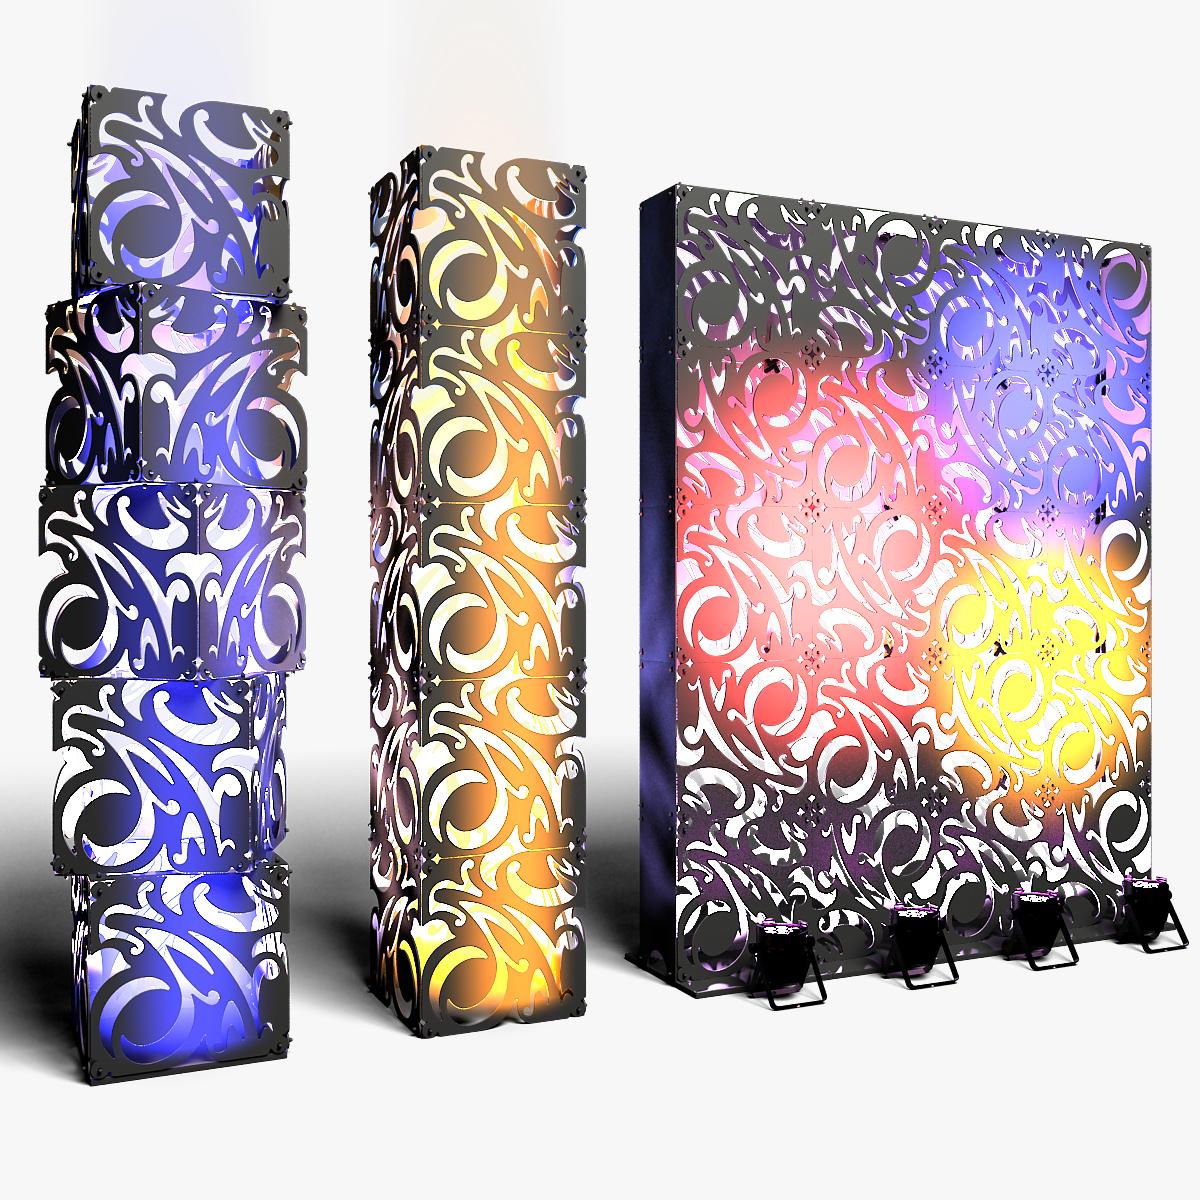 70-07-01-1200x1200.jpg Download STL file Stage Decor Collection 01 (Modular 9 Pieces) • 3D printer model, akerStudio